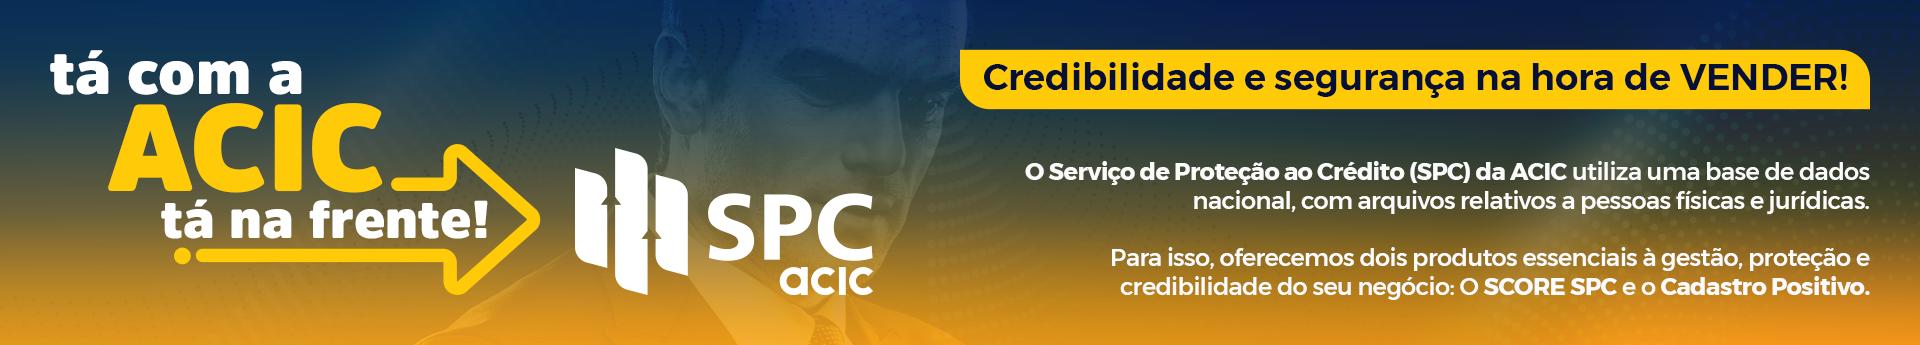 SPC Acic